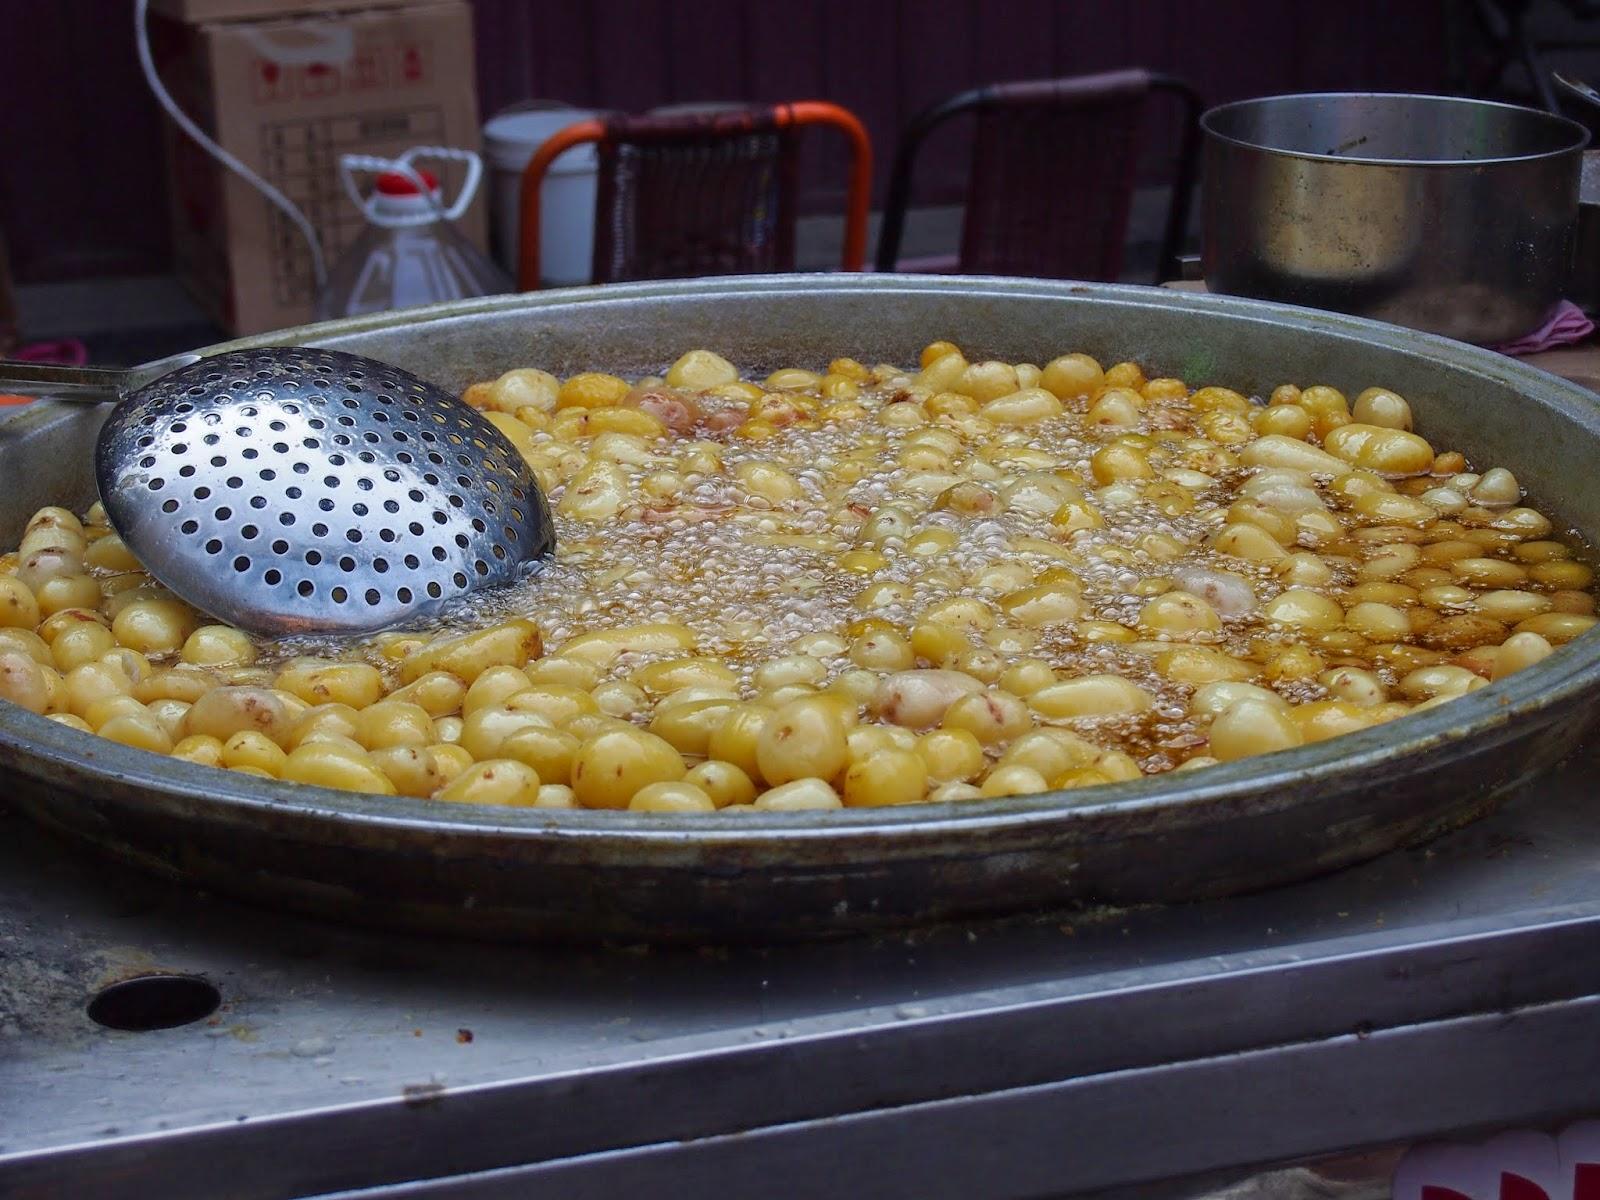 frying potatoes for street food in Xi'an